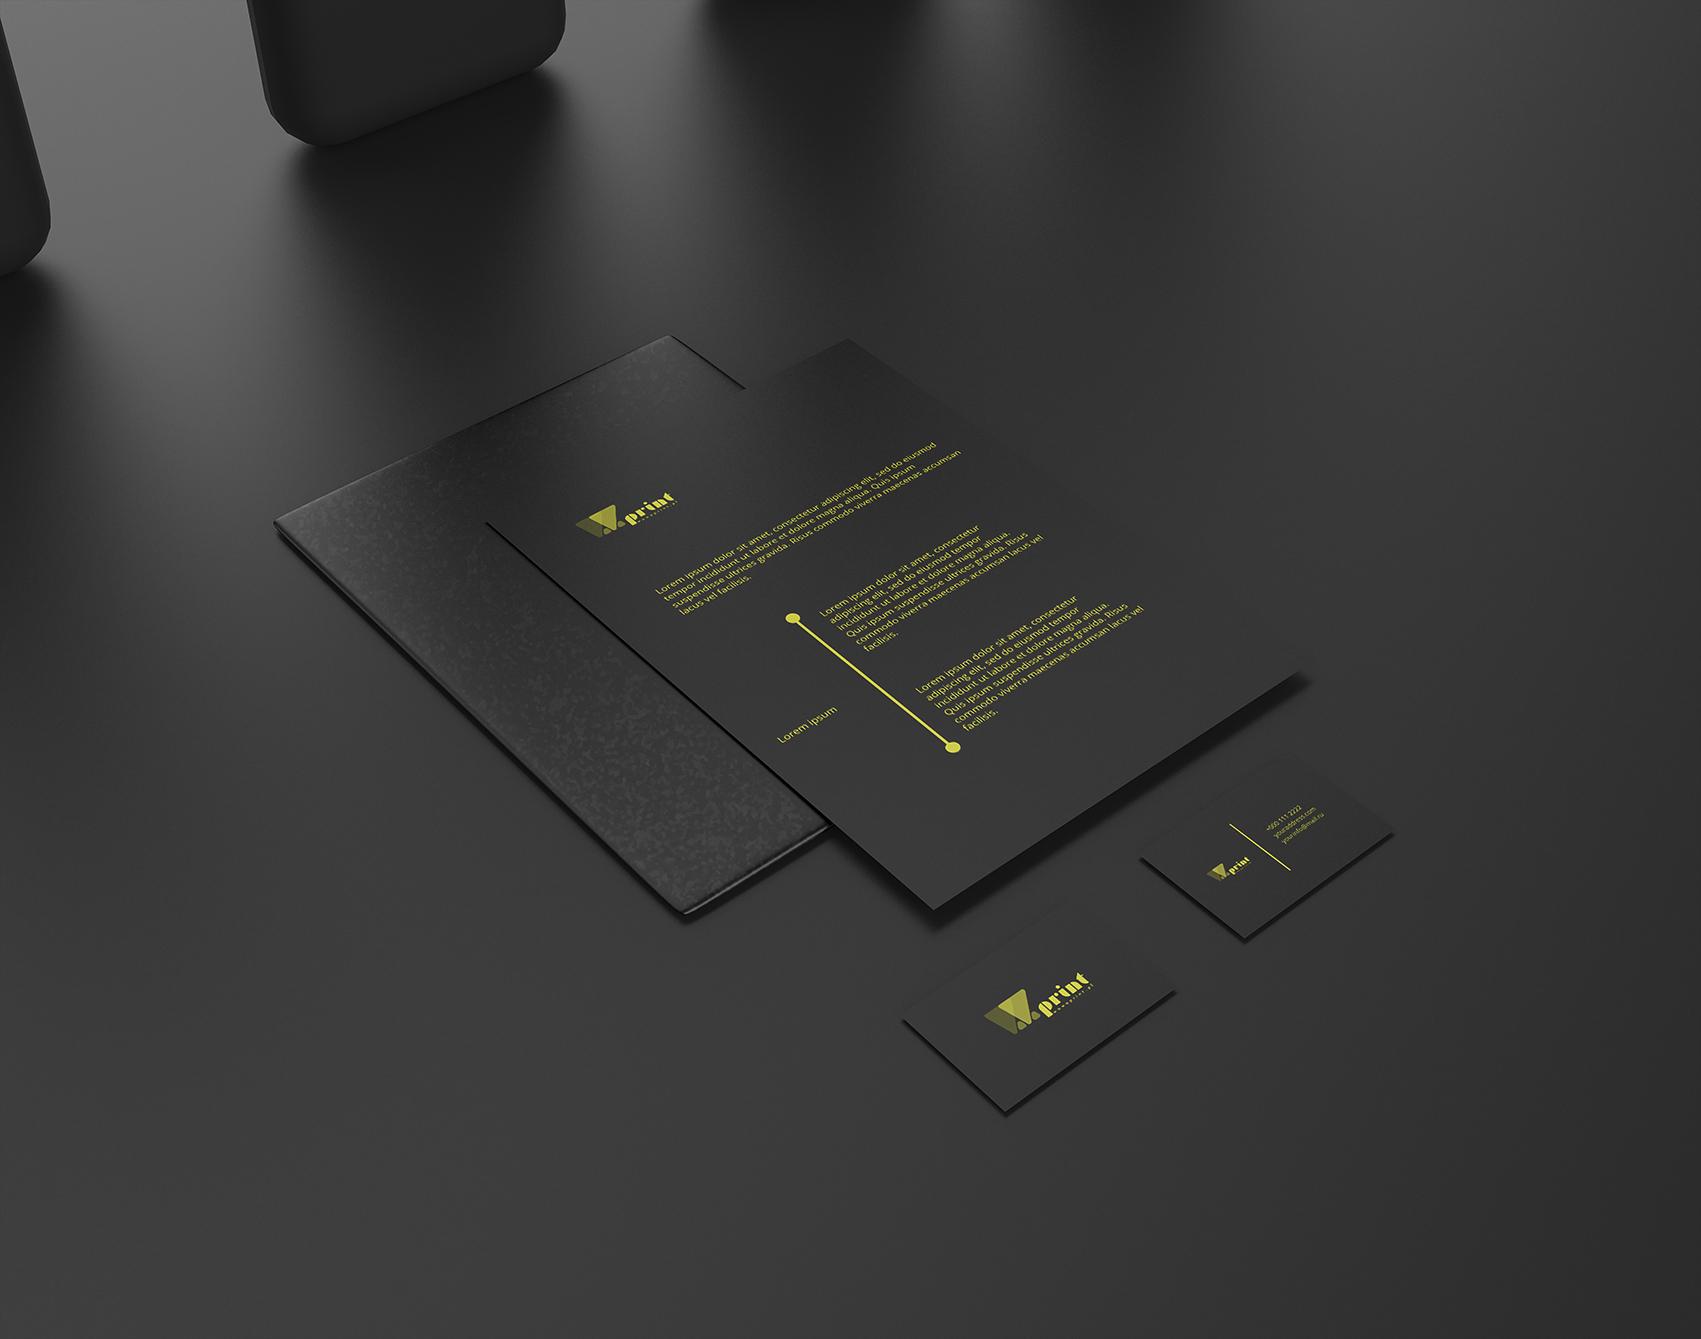 Papier firmowy_image1